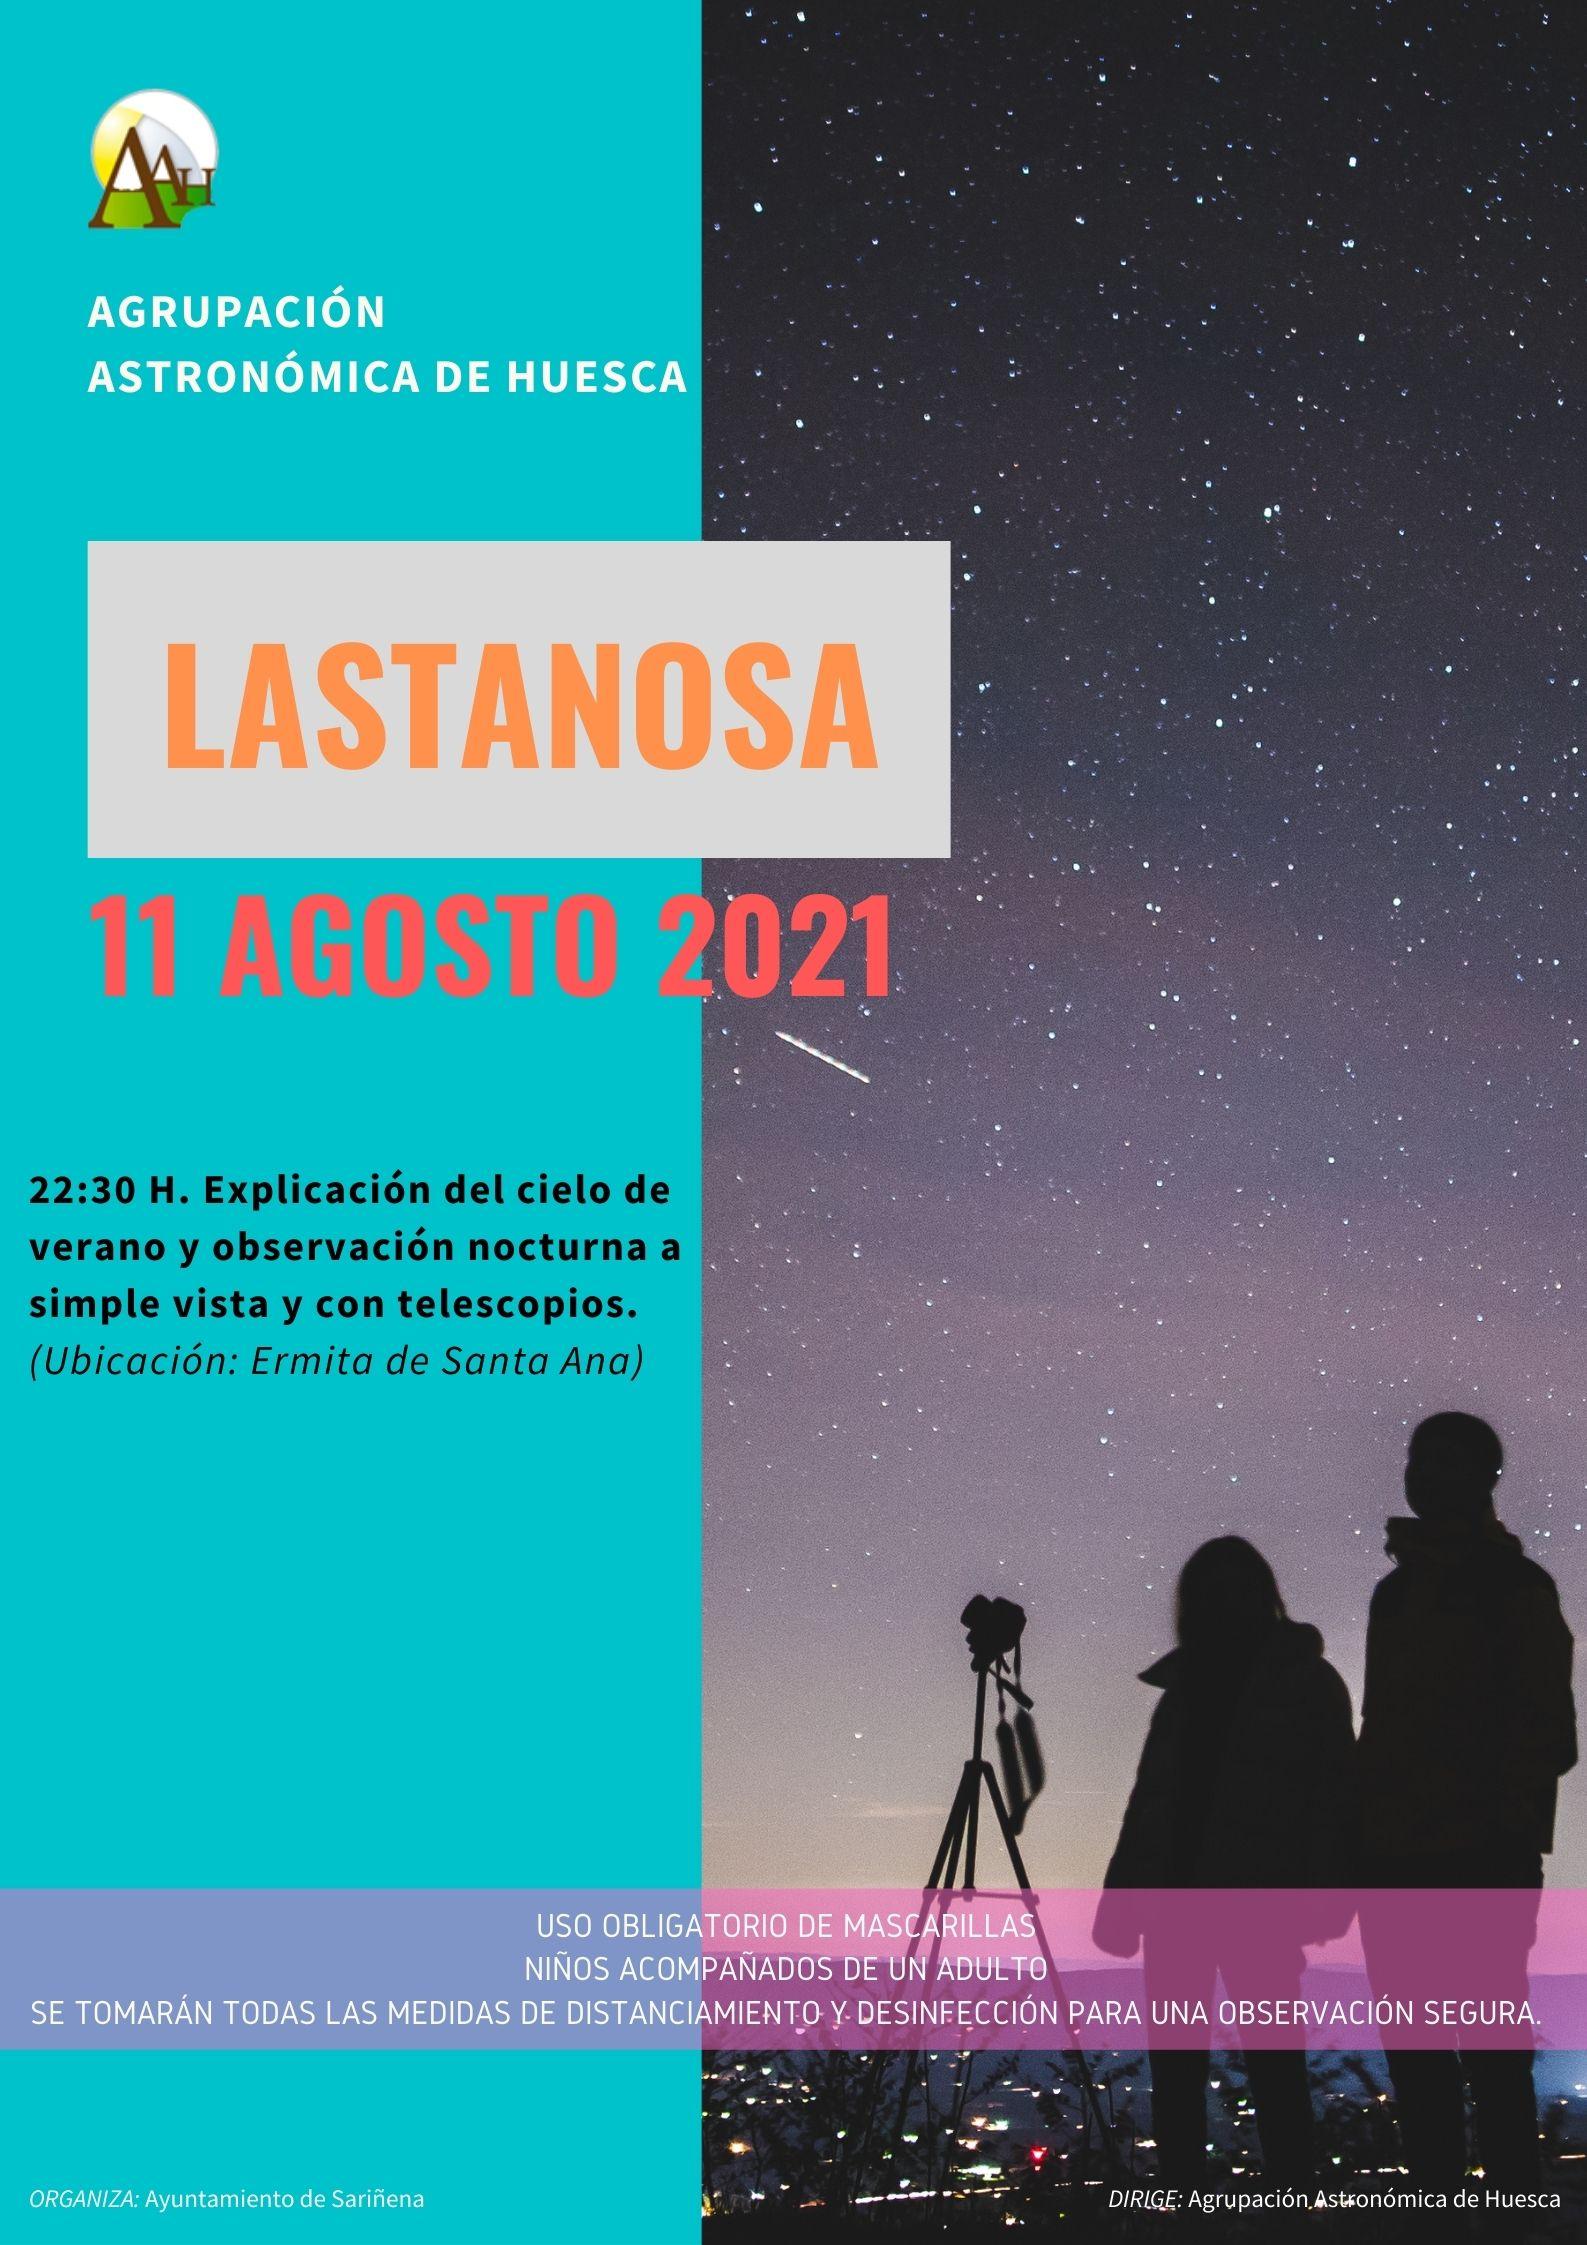 Lastanosa